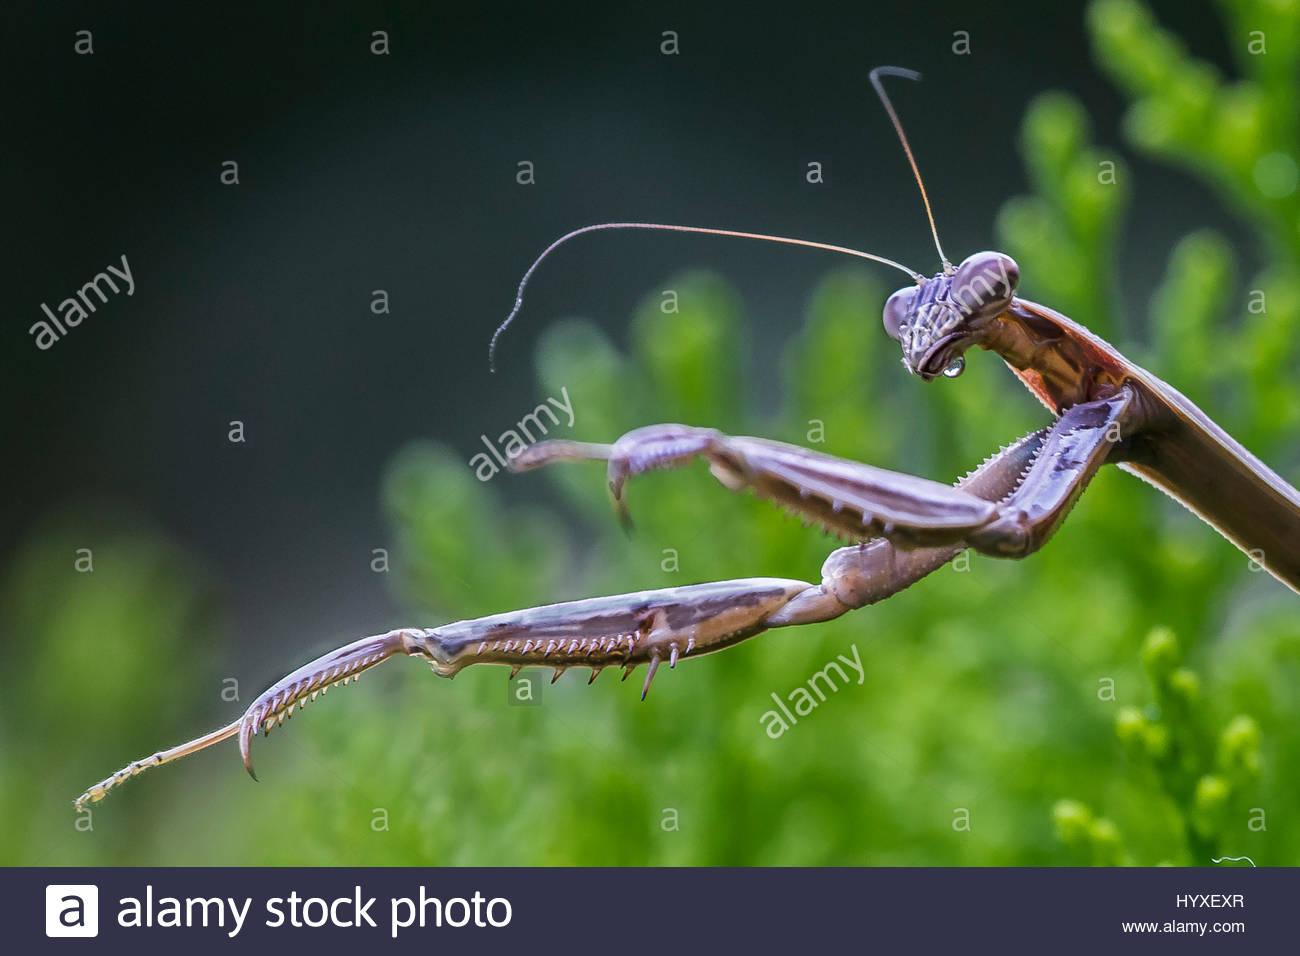 A praying mantis, Mantis religiosa, hunting, in an evergreen bush. Stock Photo